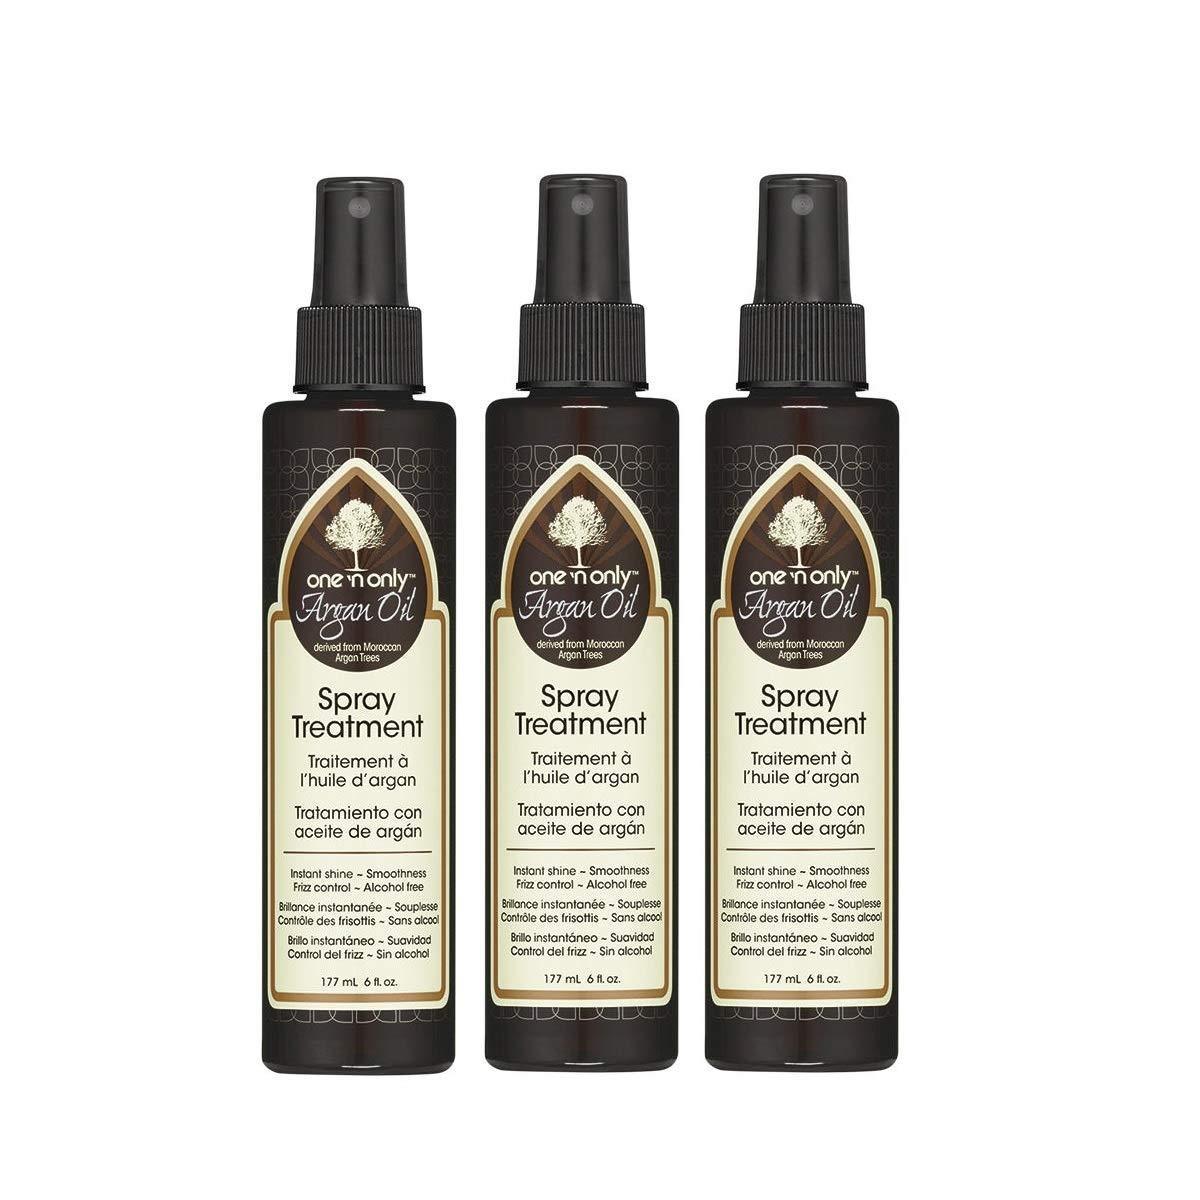 One N Only Argan Oil Spray Treatment 6oz (3 Pack)